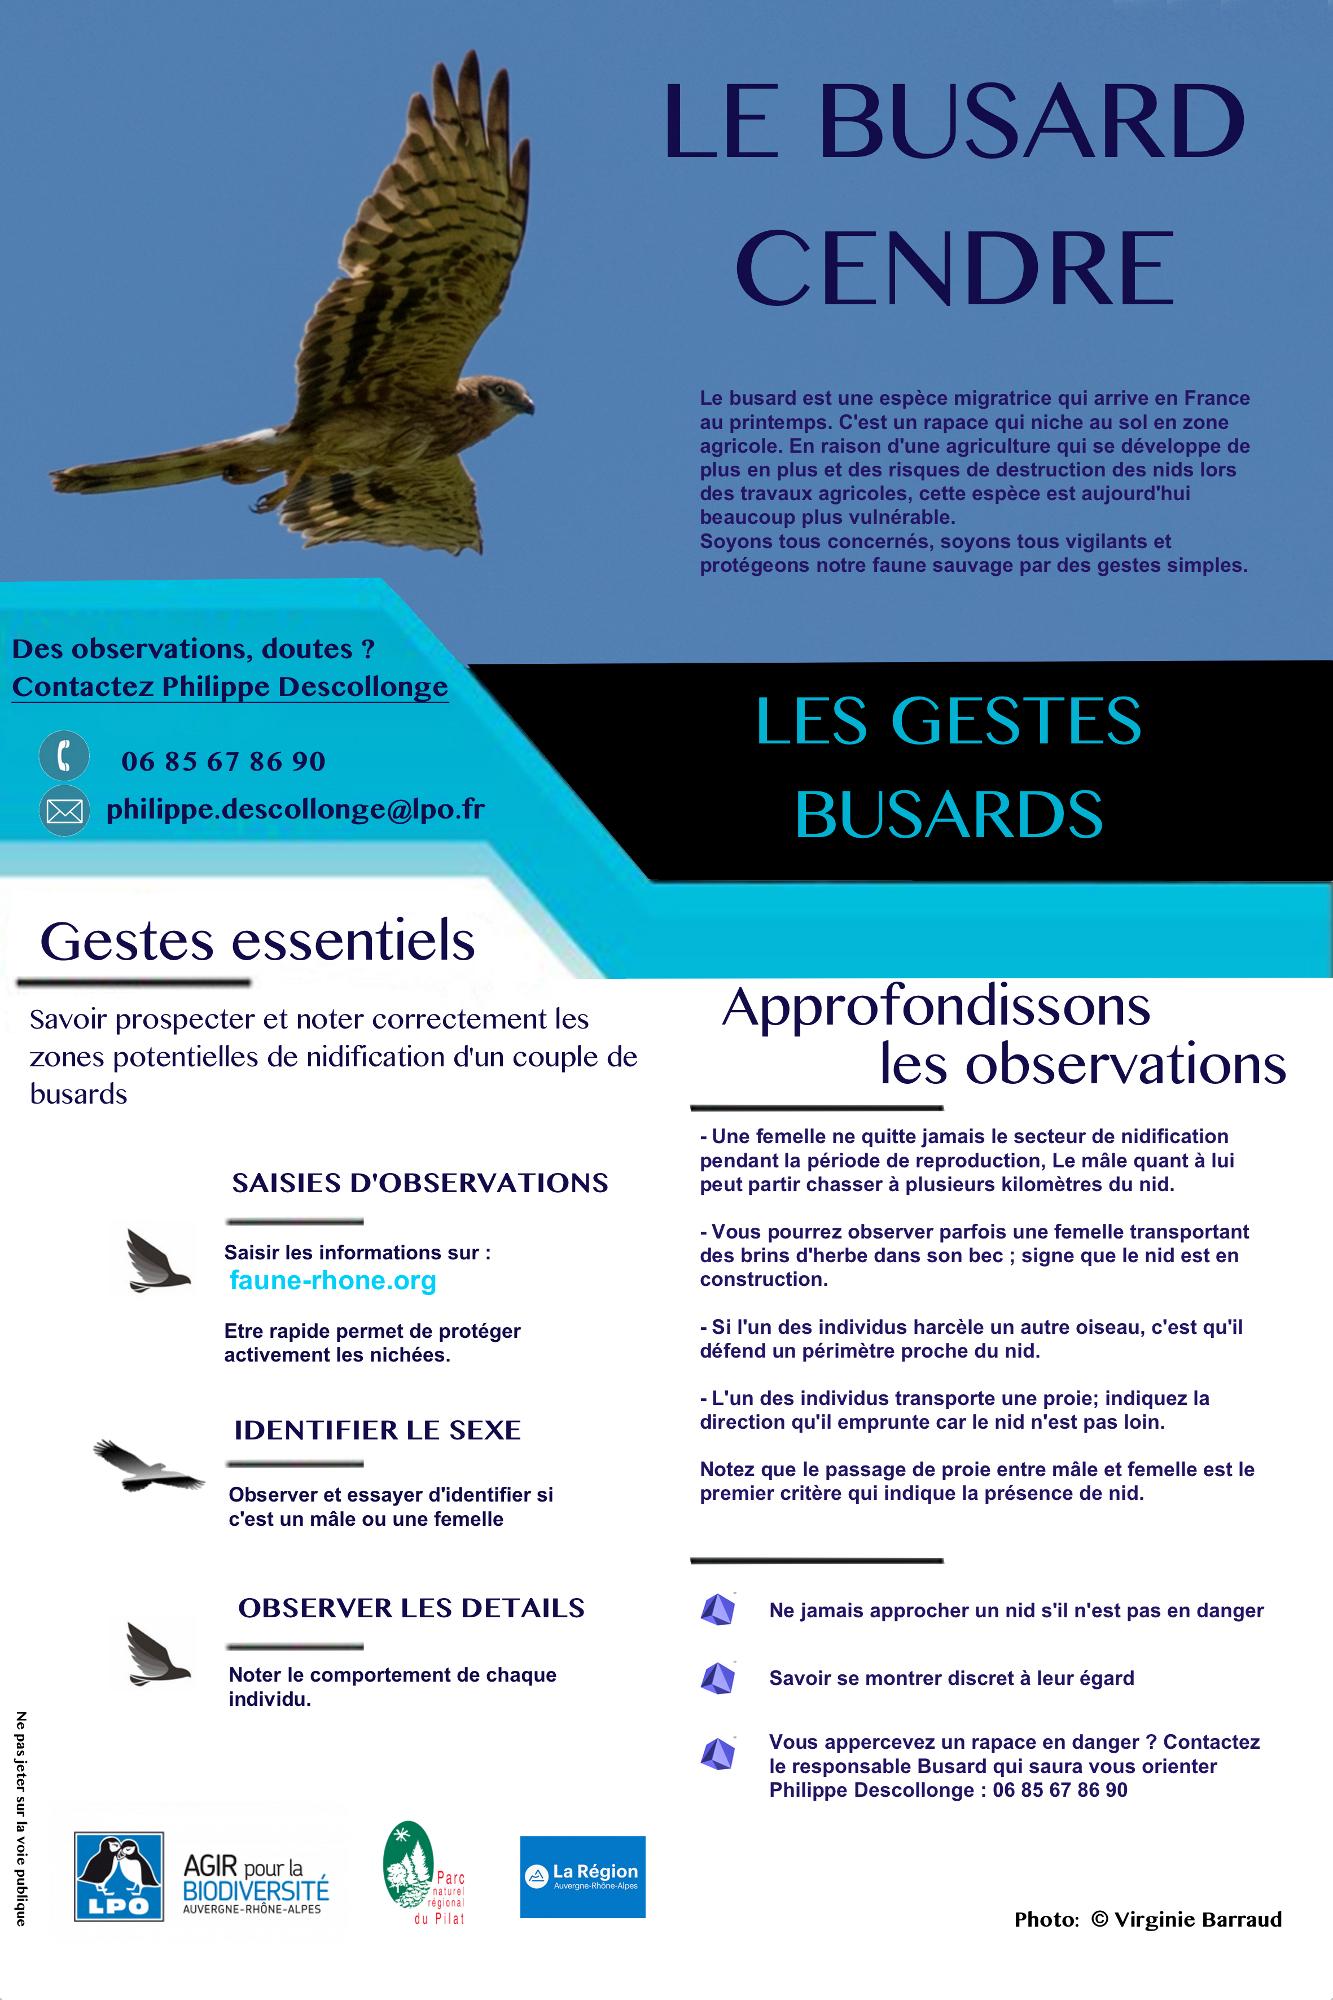 https://cdnfiles1.biolovision.net/www.faune-rhone.org/userfiles/Documents/Illustrationsnews/Busardsensibilisation-INTERFACE2.jpg